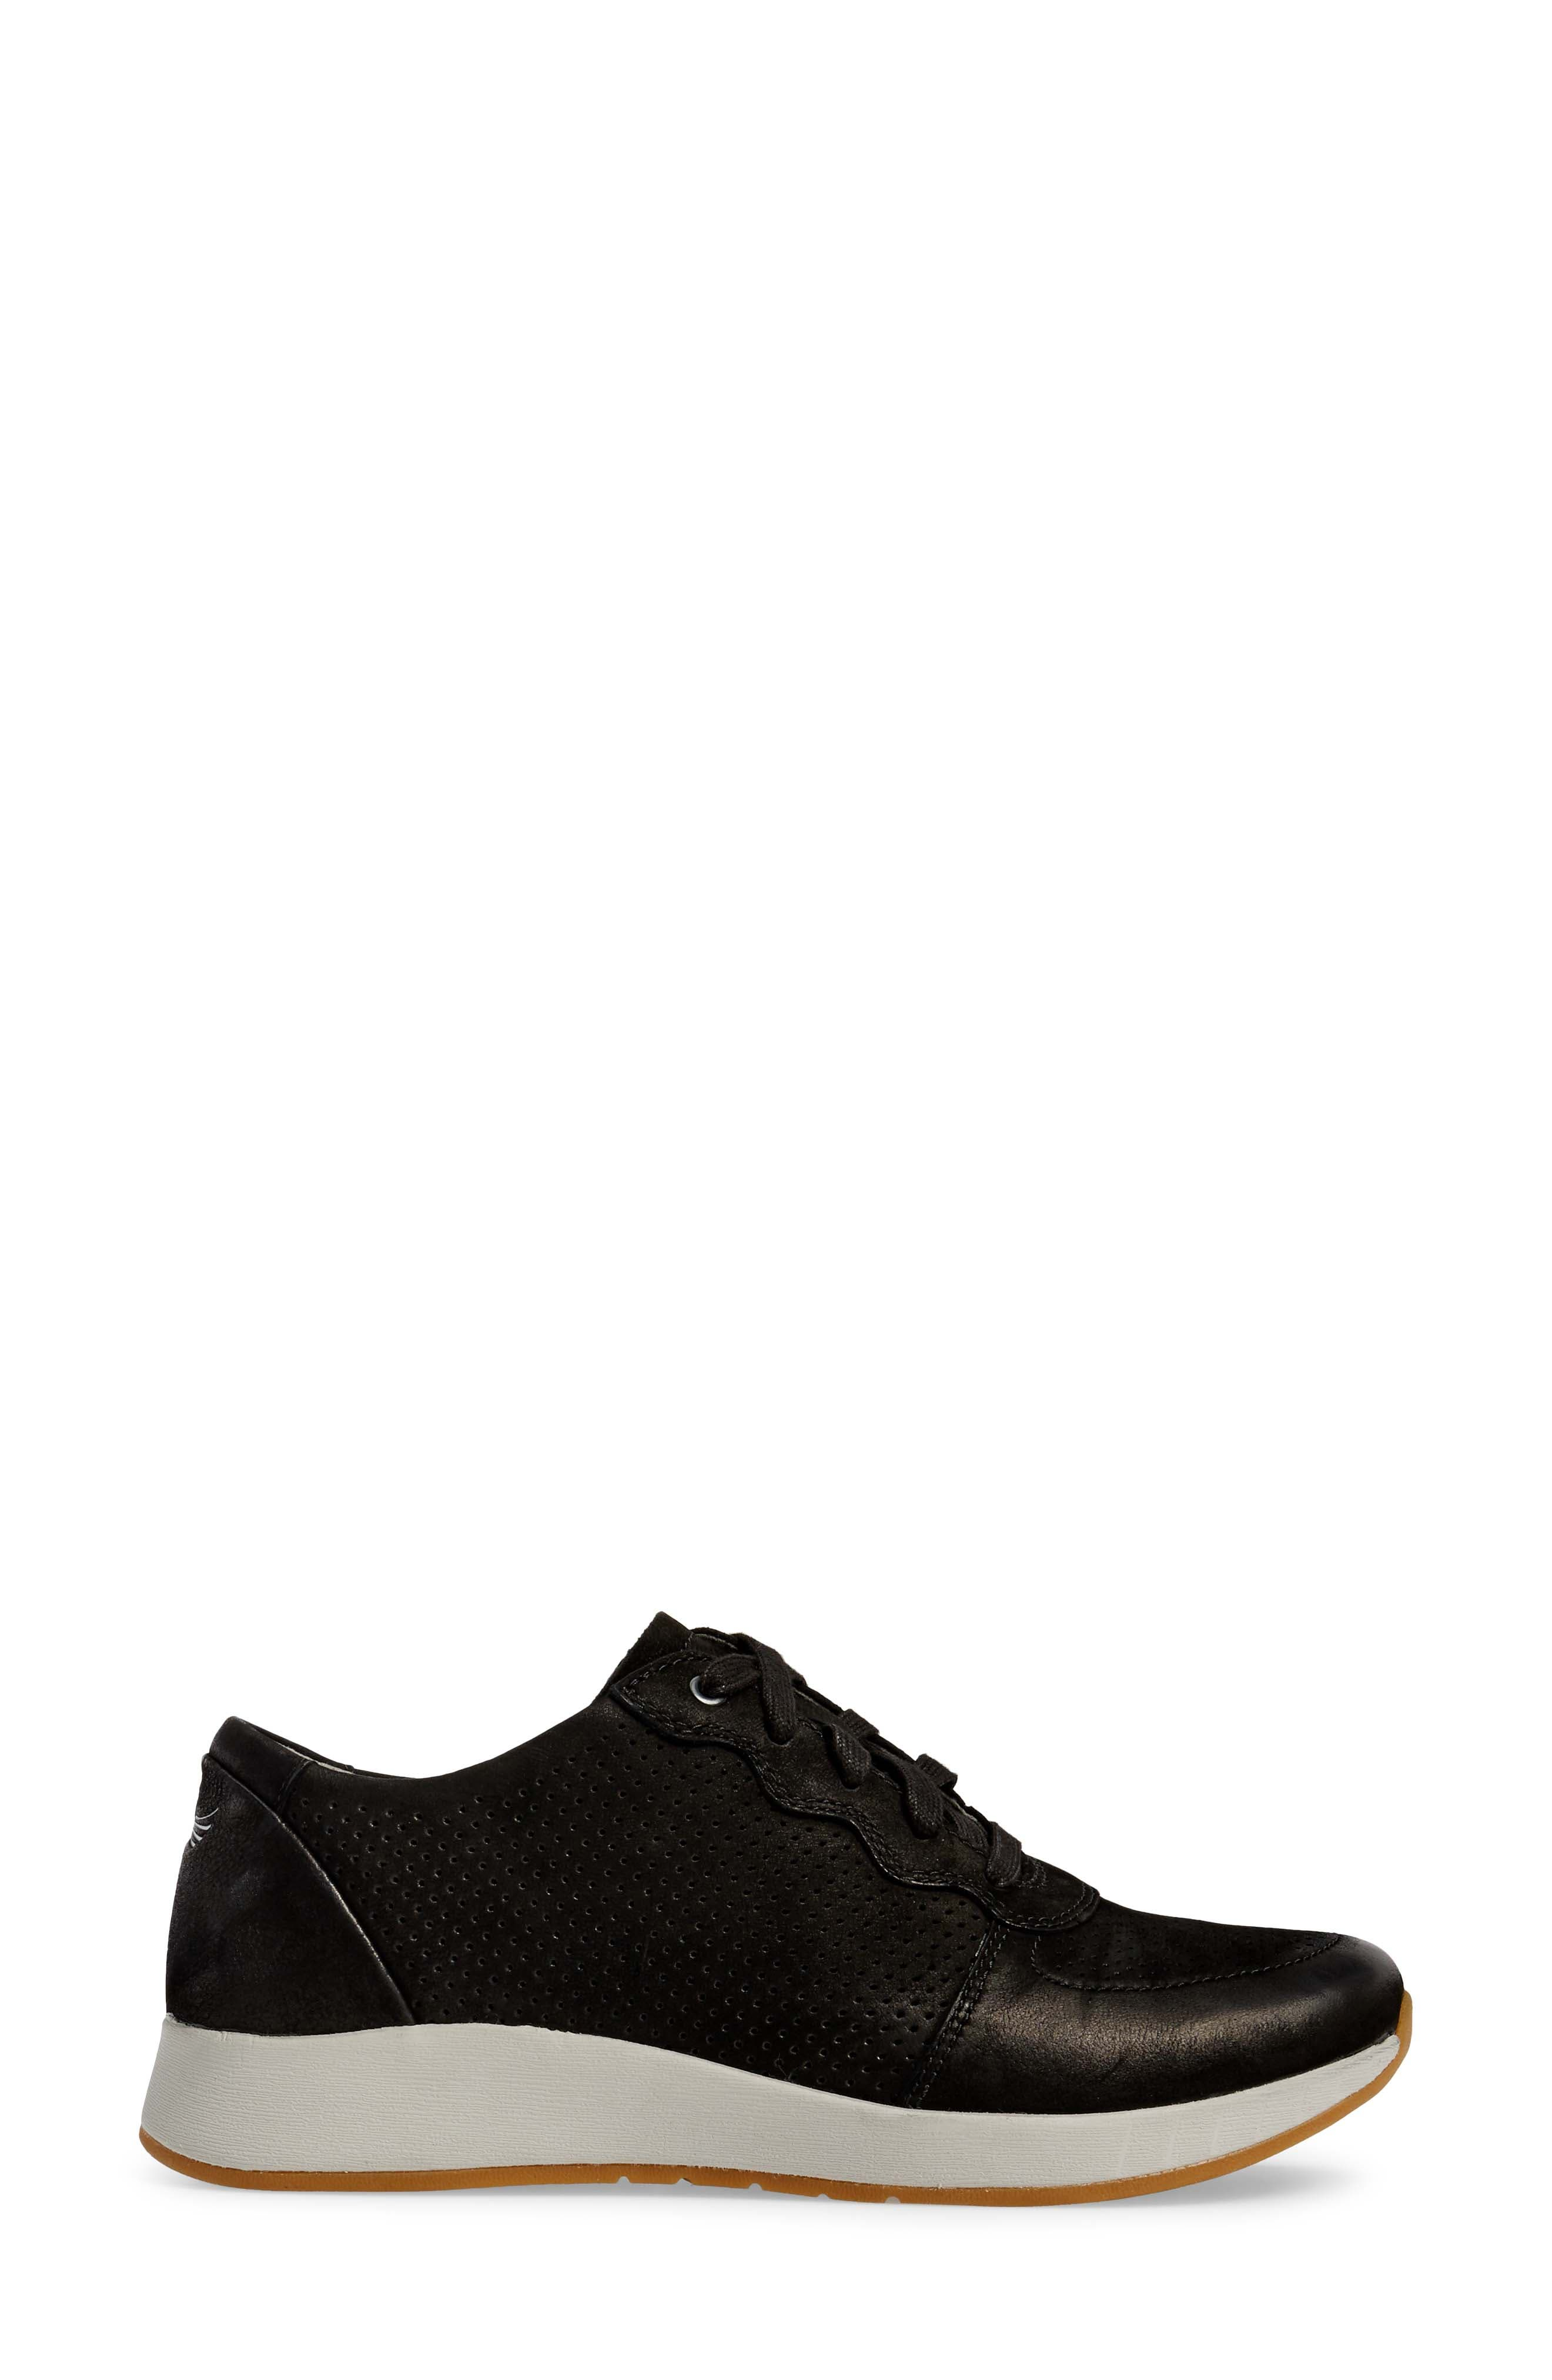 Christina Sneaker,                             Alternate thumbnail 3, color,                             Black Nubuck Leather